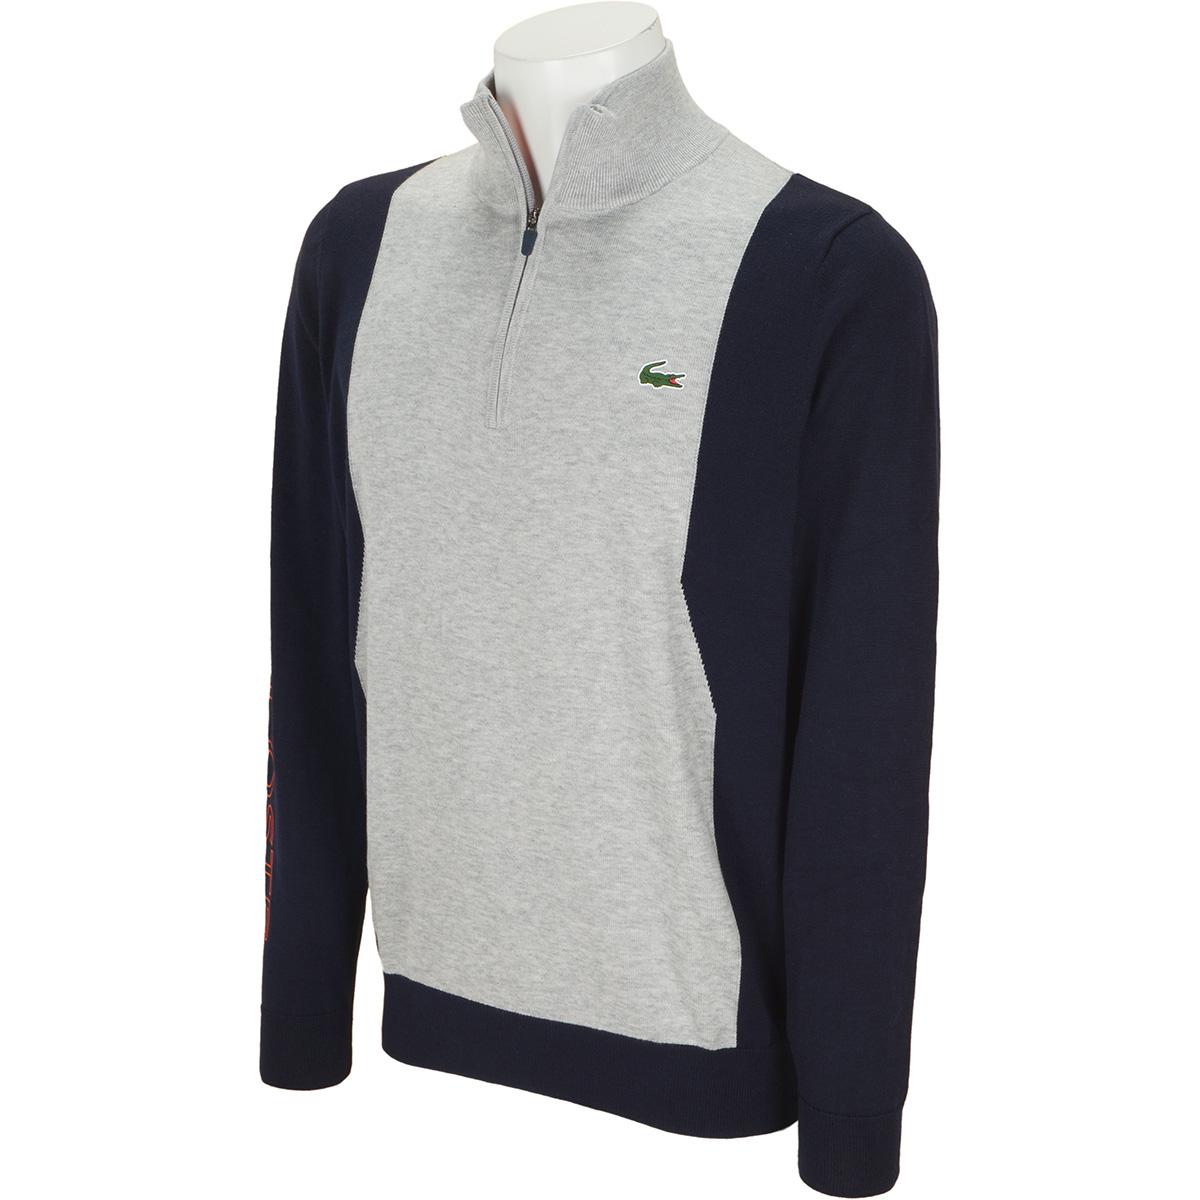 COOLMAX(R)仕様 ハーフジップゴルフセーター